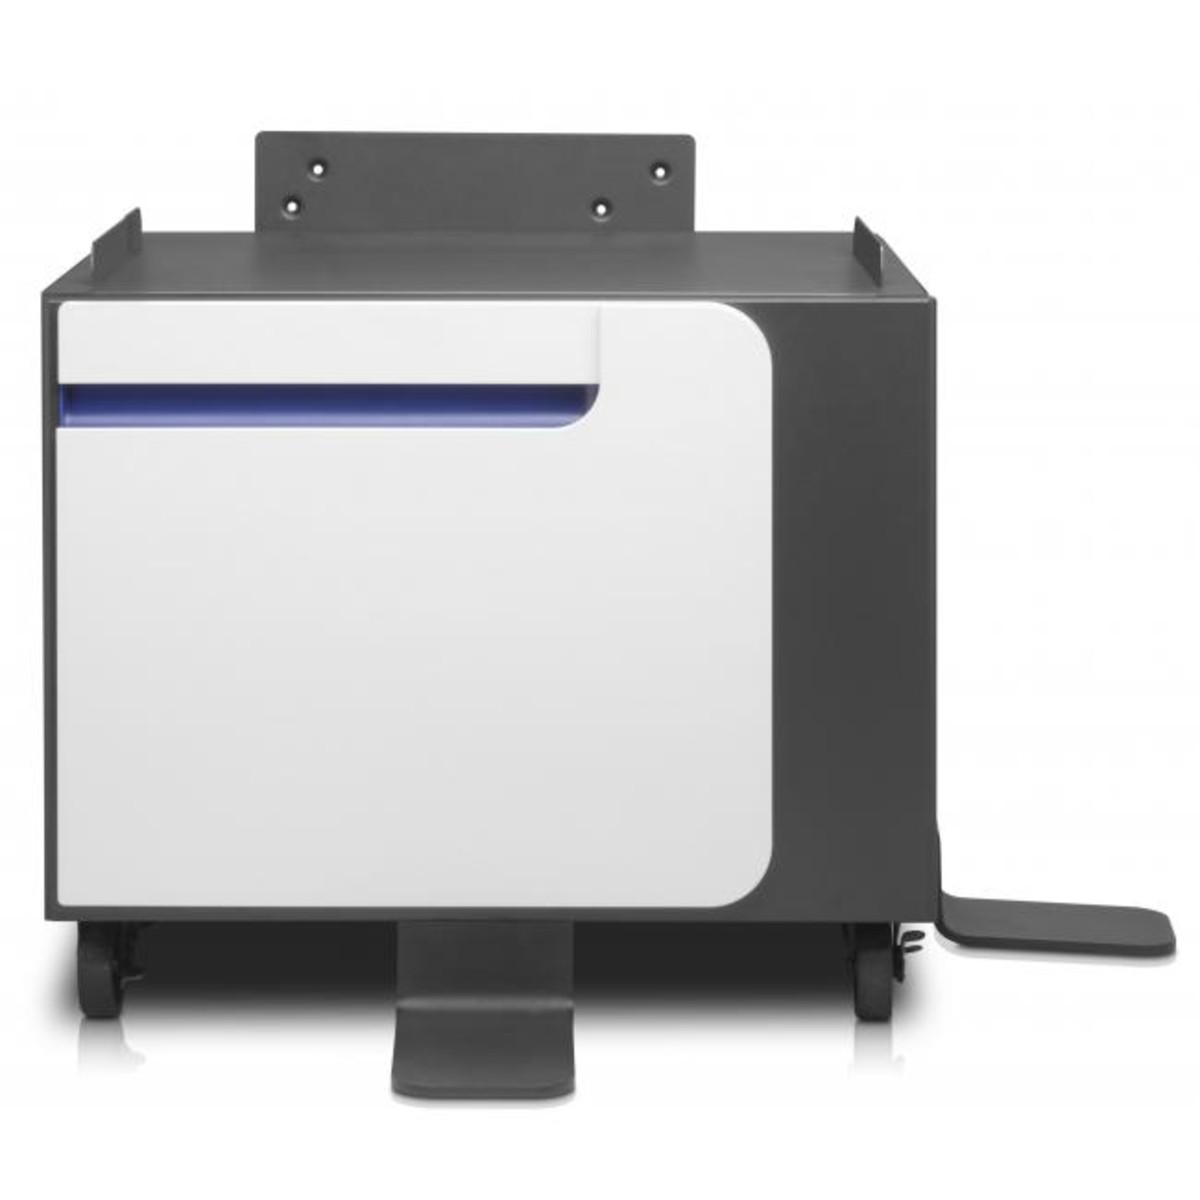 HP LaserJet 500 Colour Series Printer Cabinet